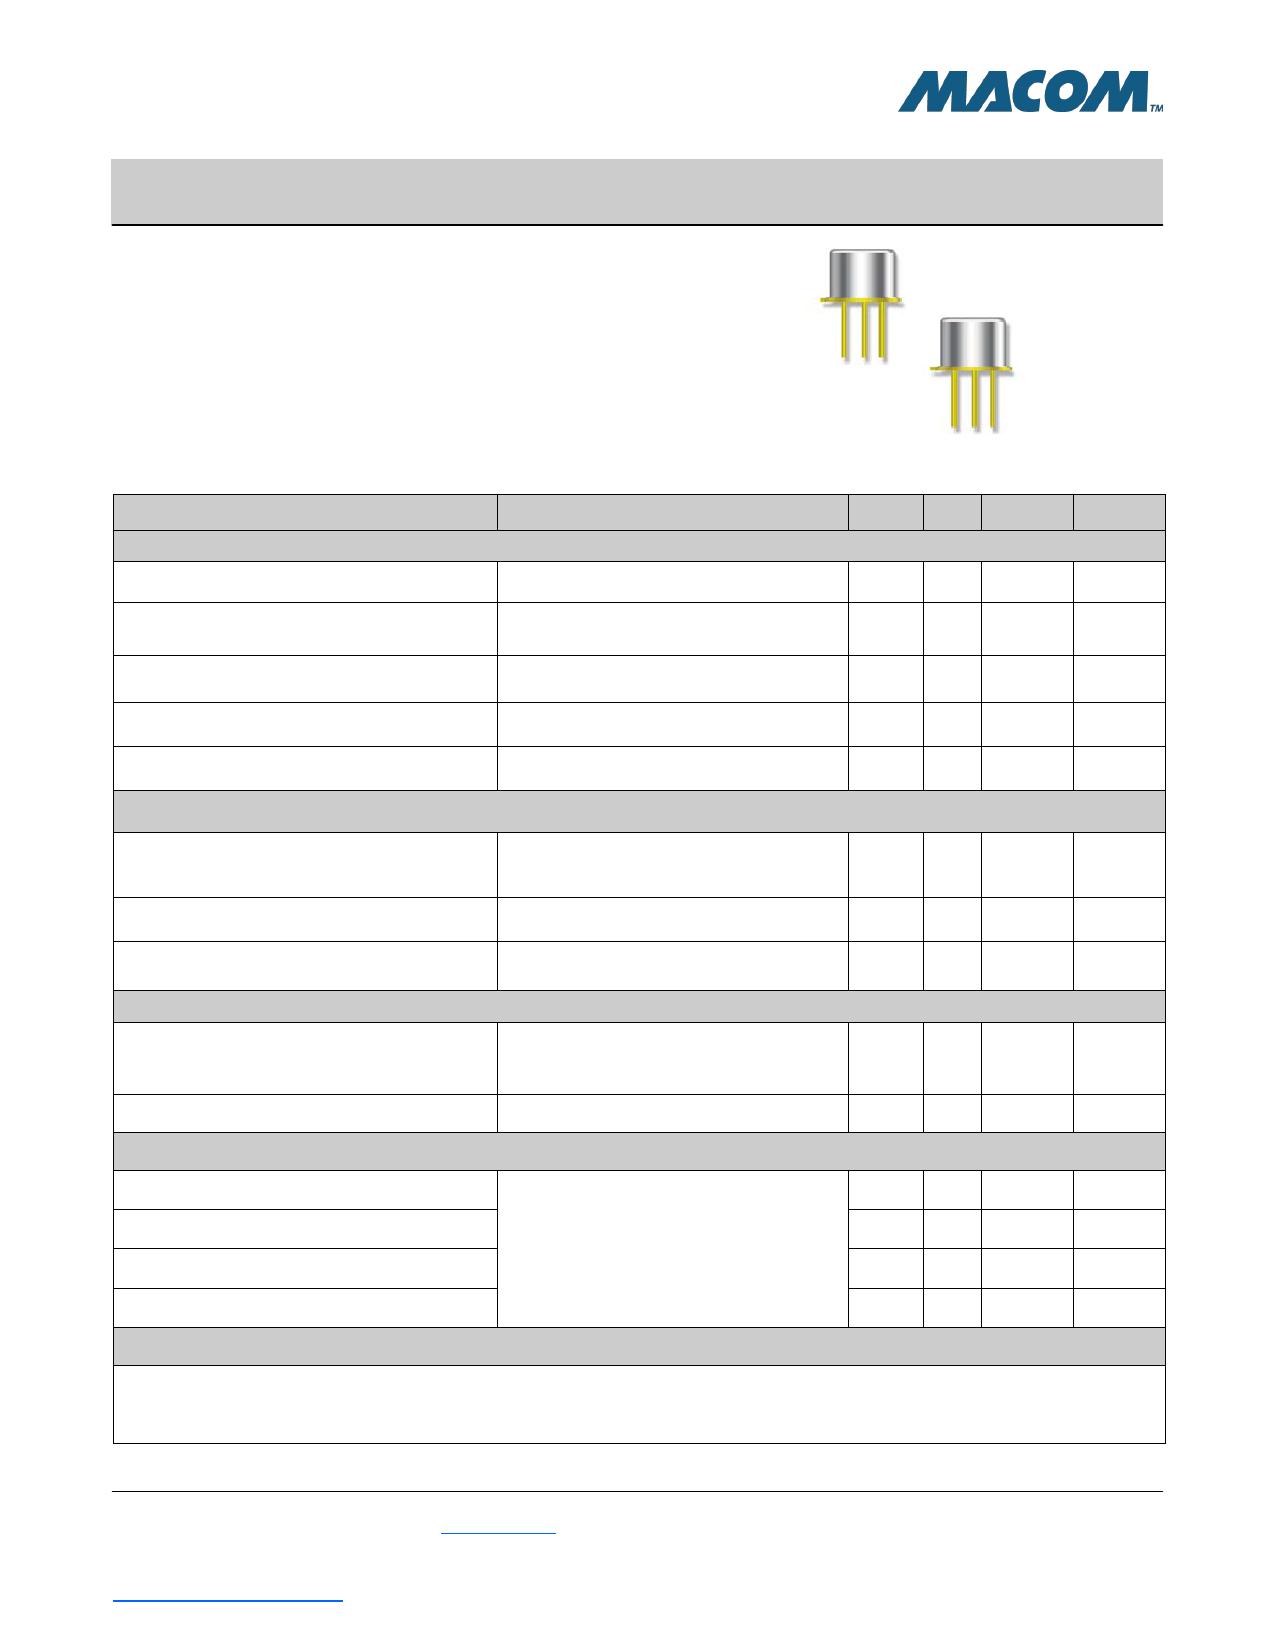 2N4150 datasheet